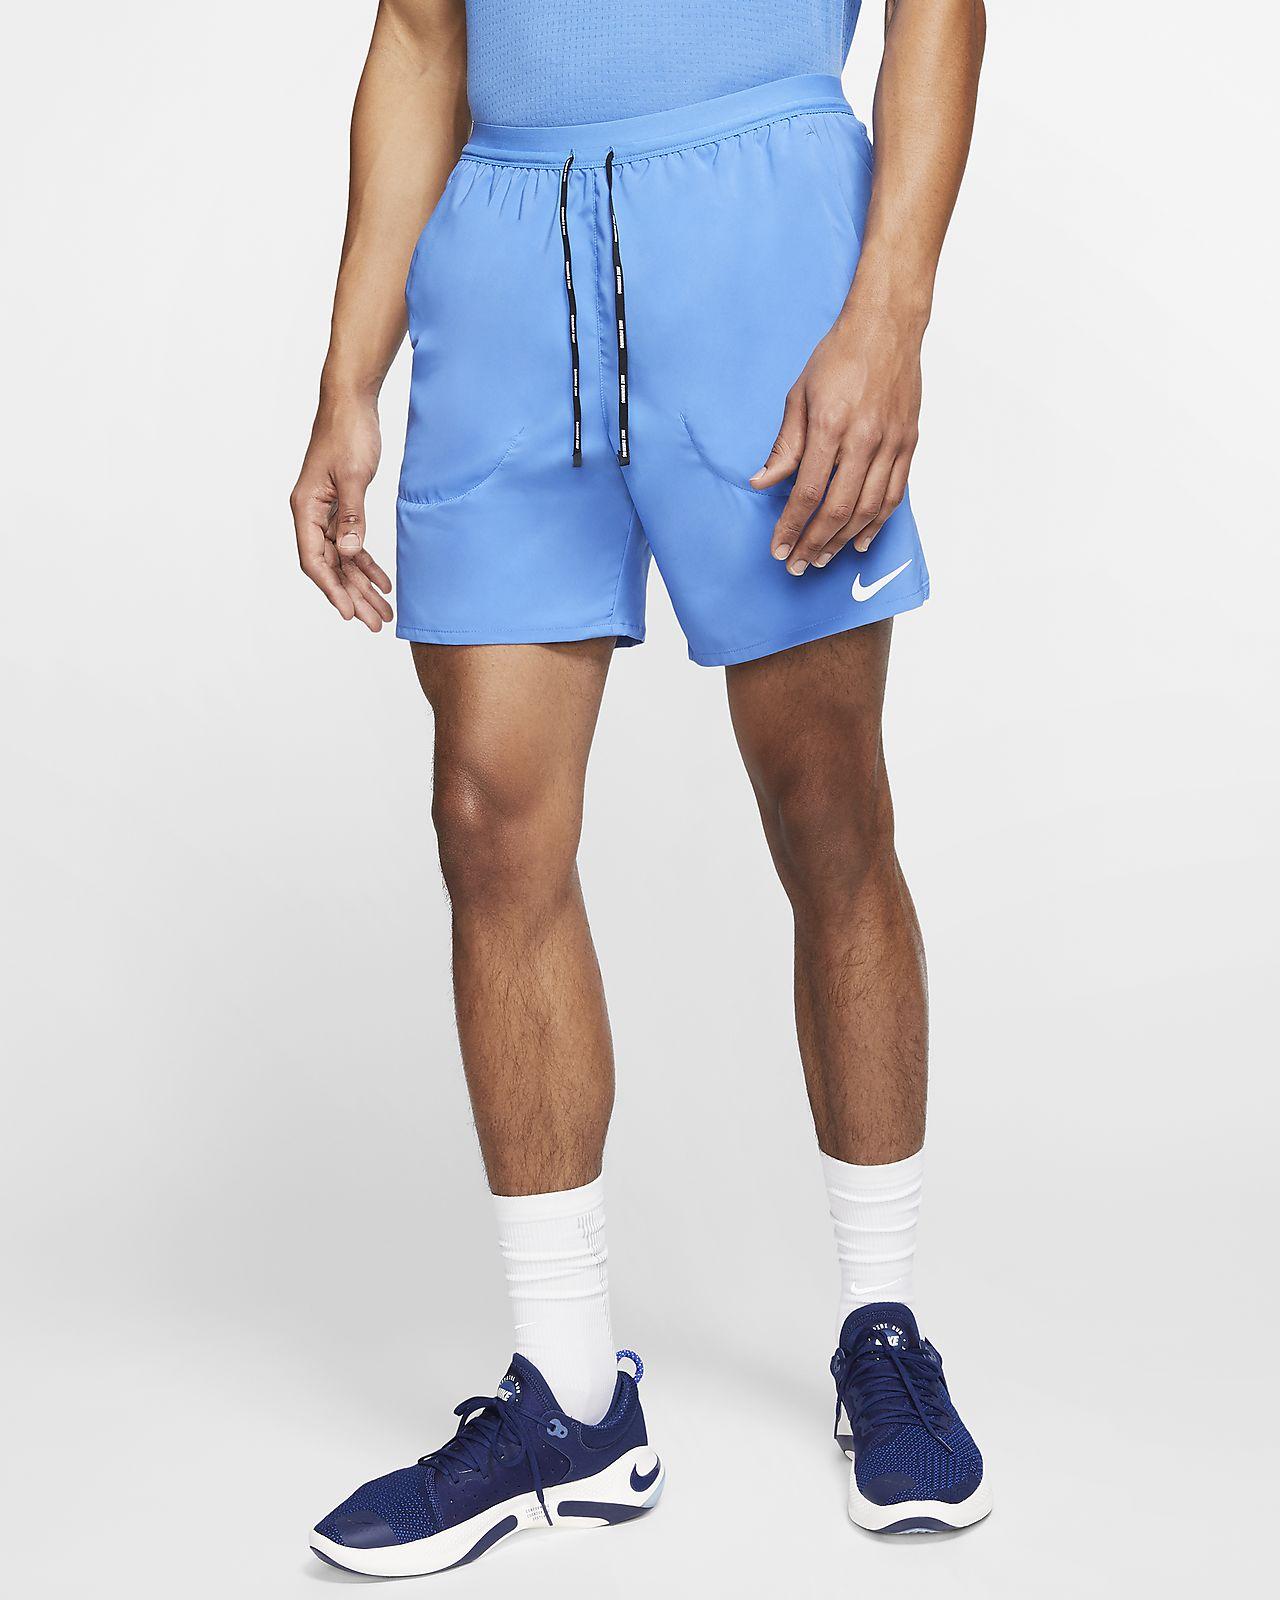 "Nike Aero Swift Max  7/"" 18 cm approx 2-in-1 RUNNING Shorts Size S M Black"